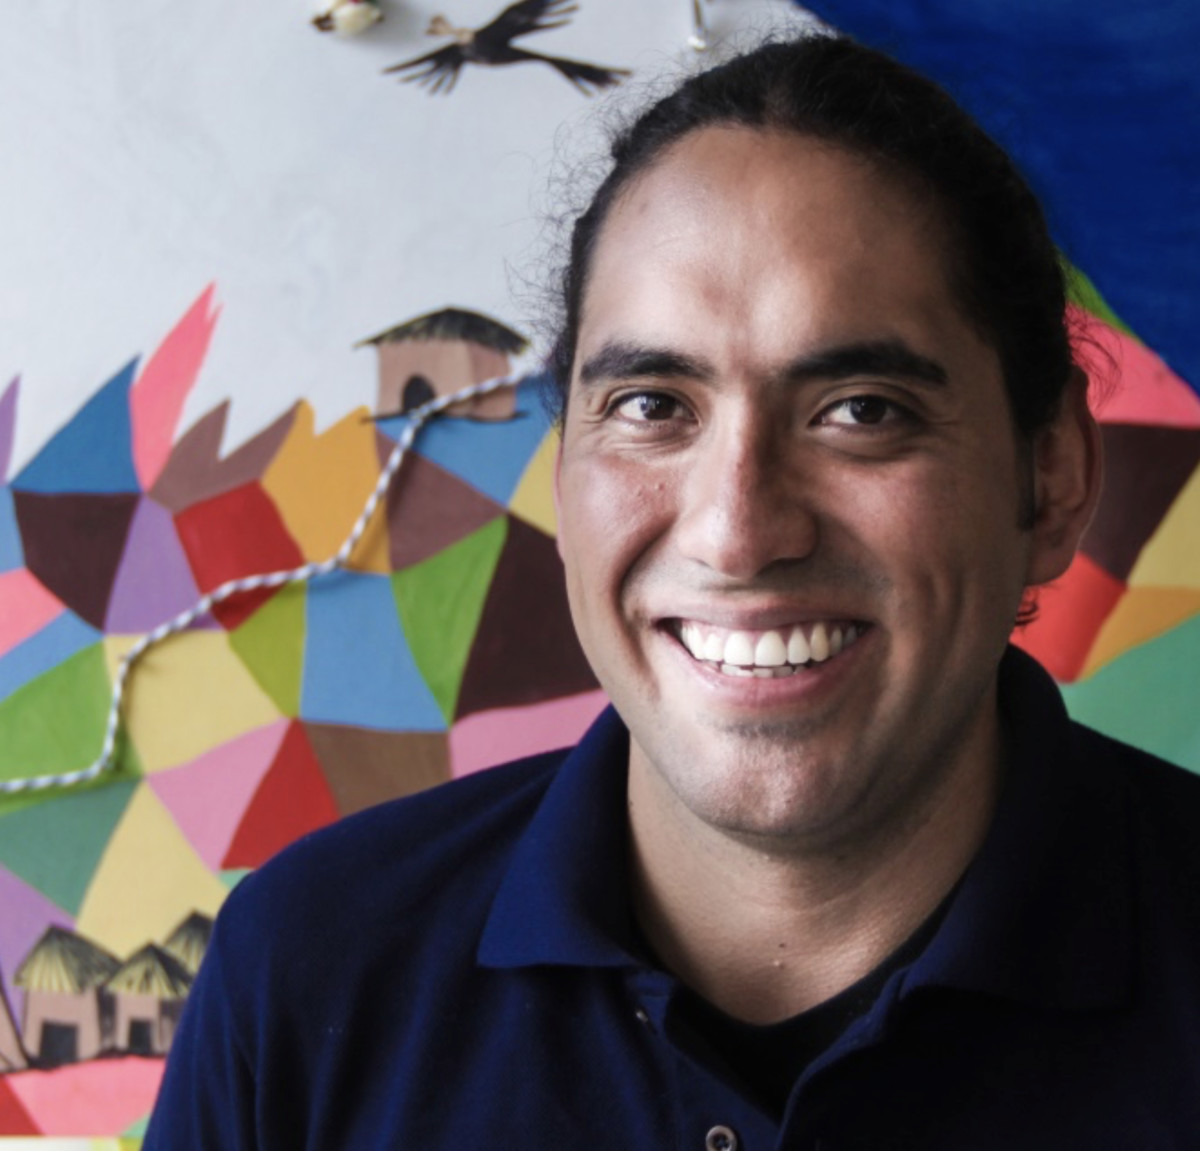 Global Glimpse Team - Paco Romero